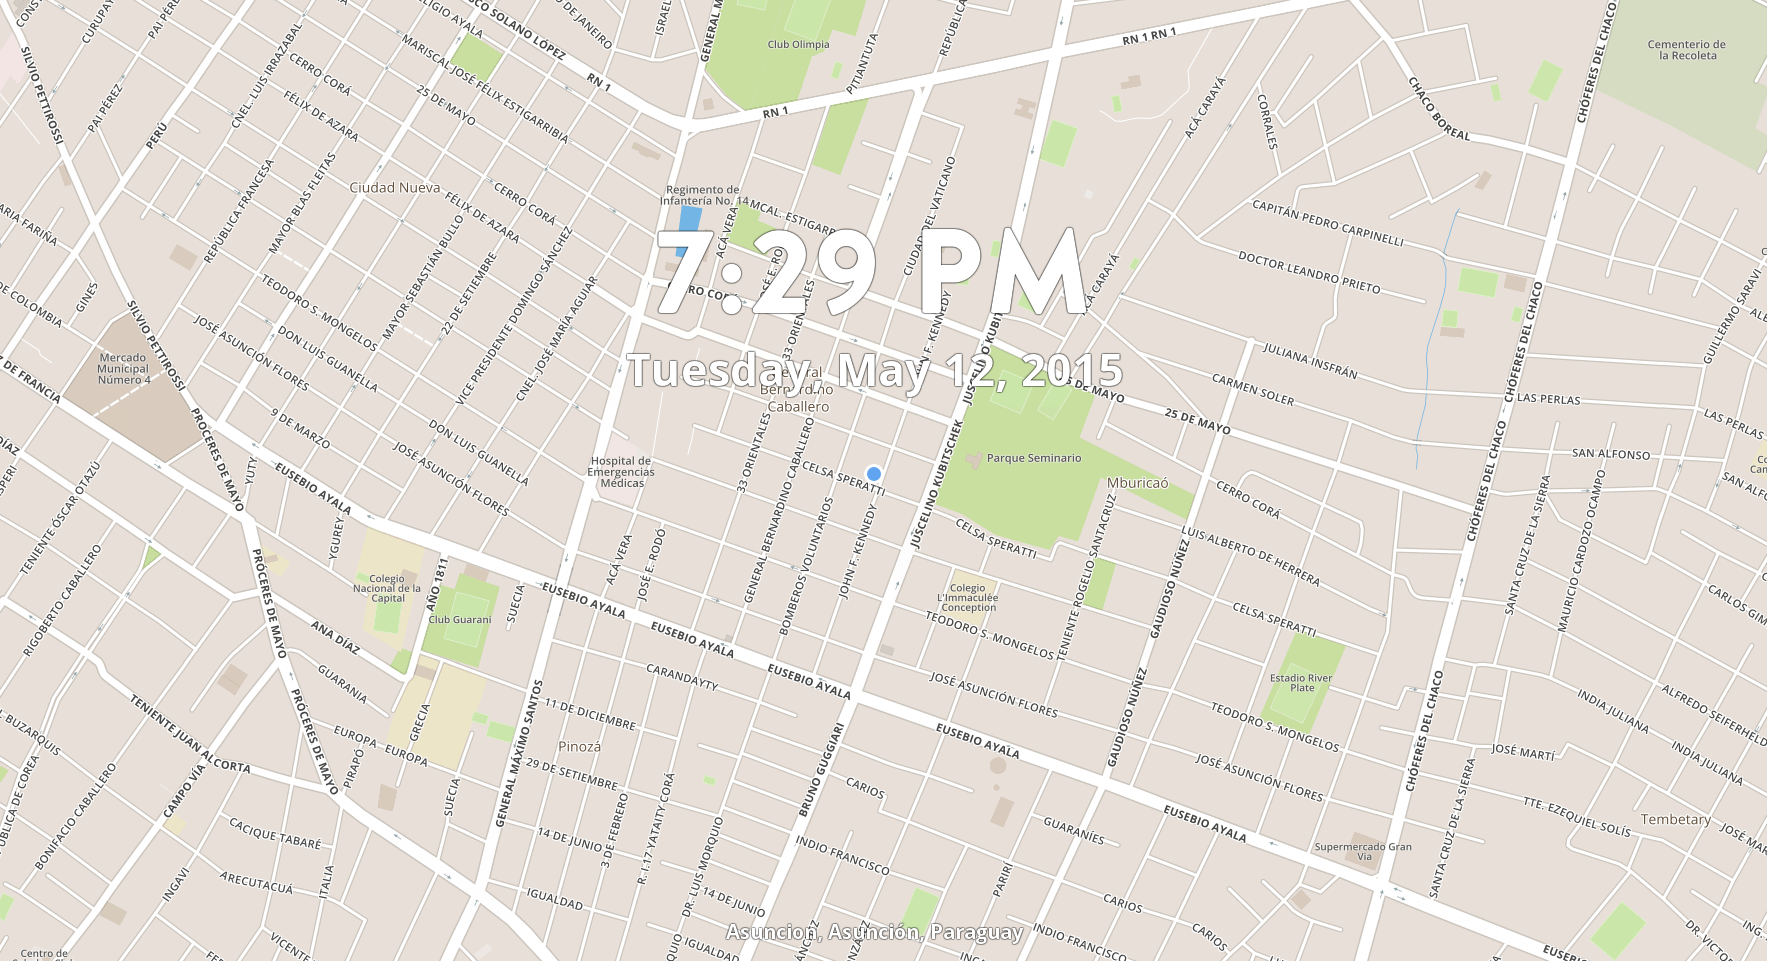 MapTab - extension en Google Chrome para visualizar mapas Mapbox